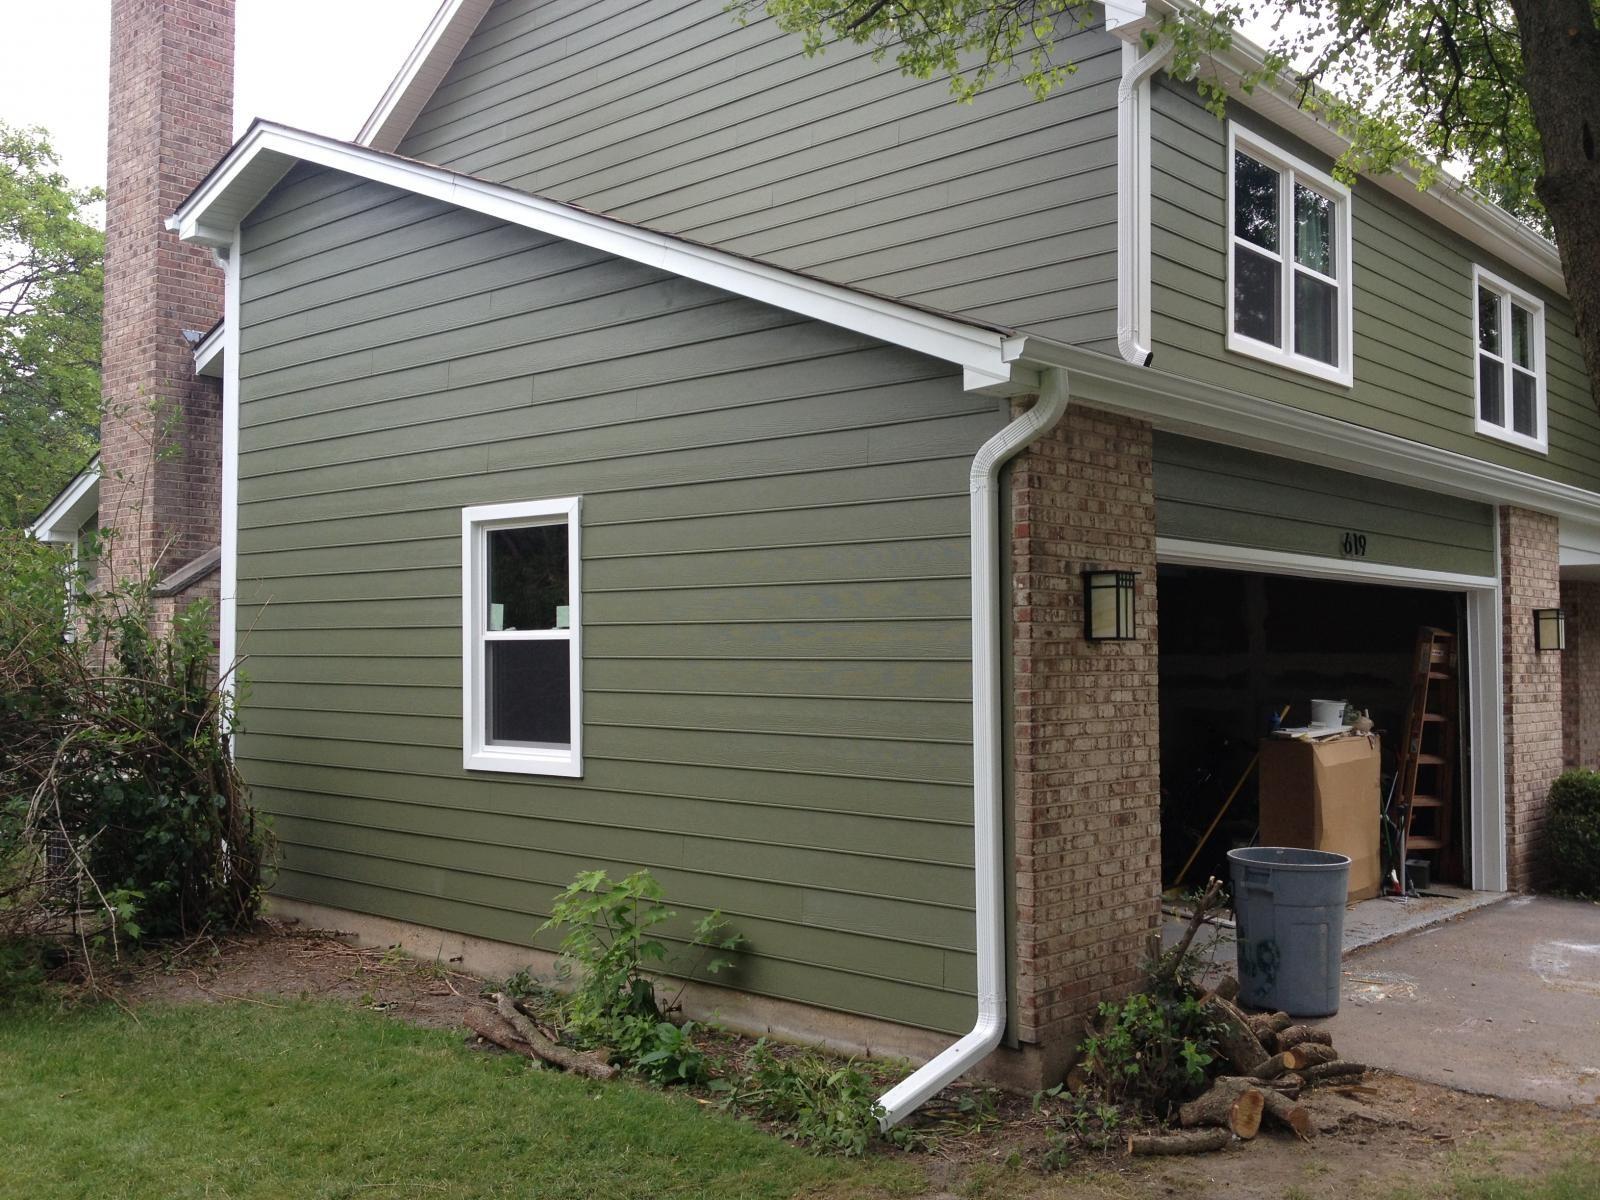 House colors on pinterest paint colors craftsman and james hardie - House James Hardie